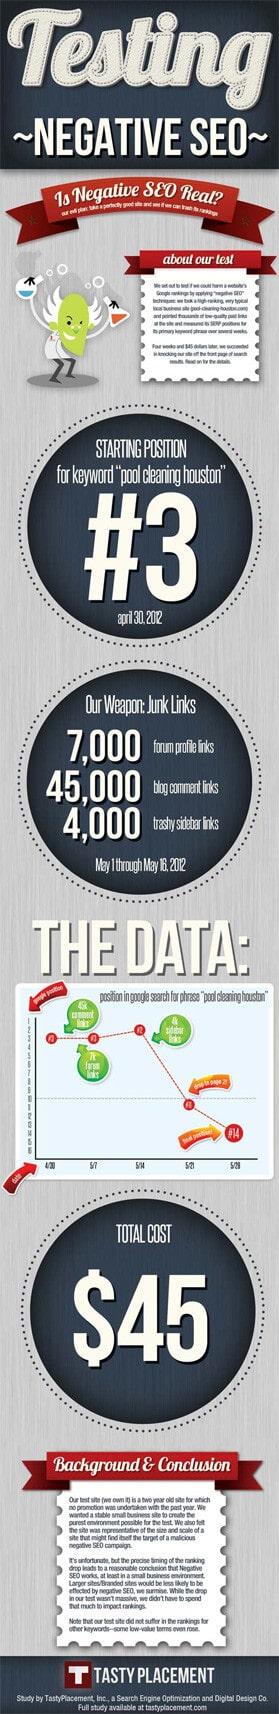 Negative SEO Infographic